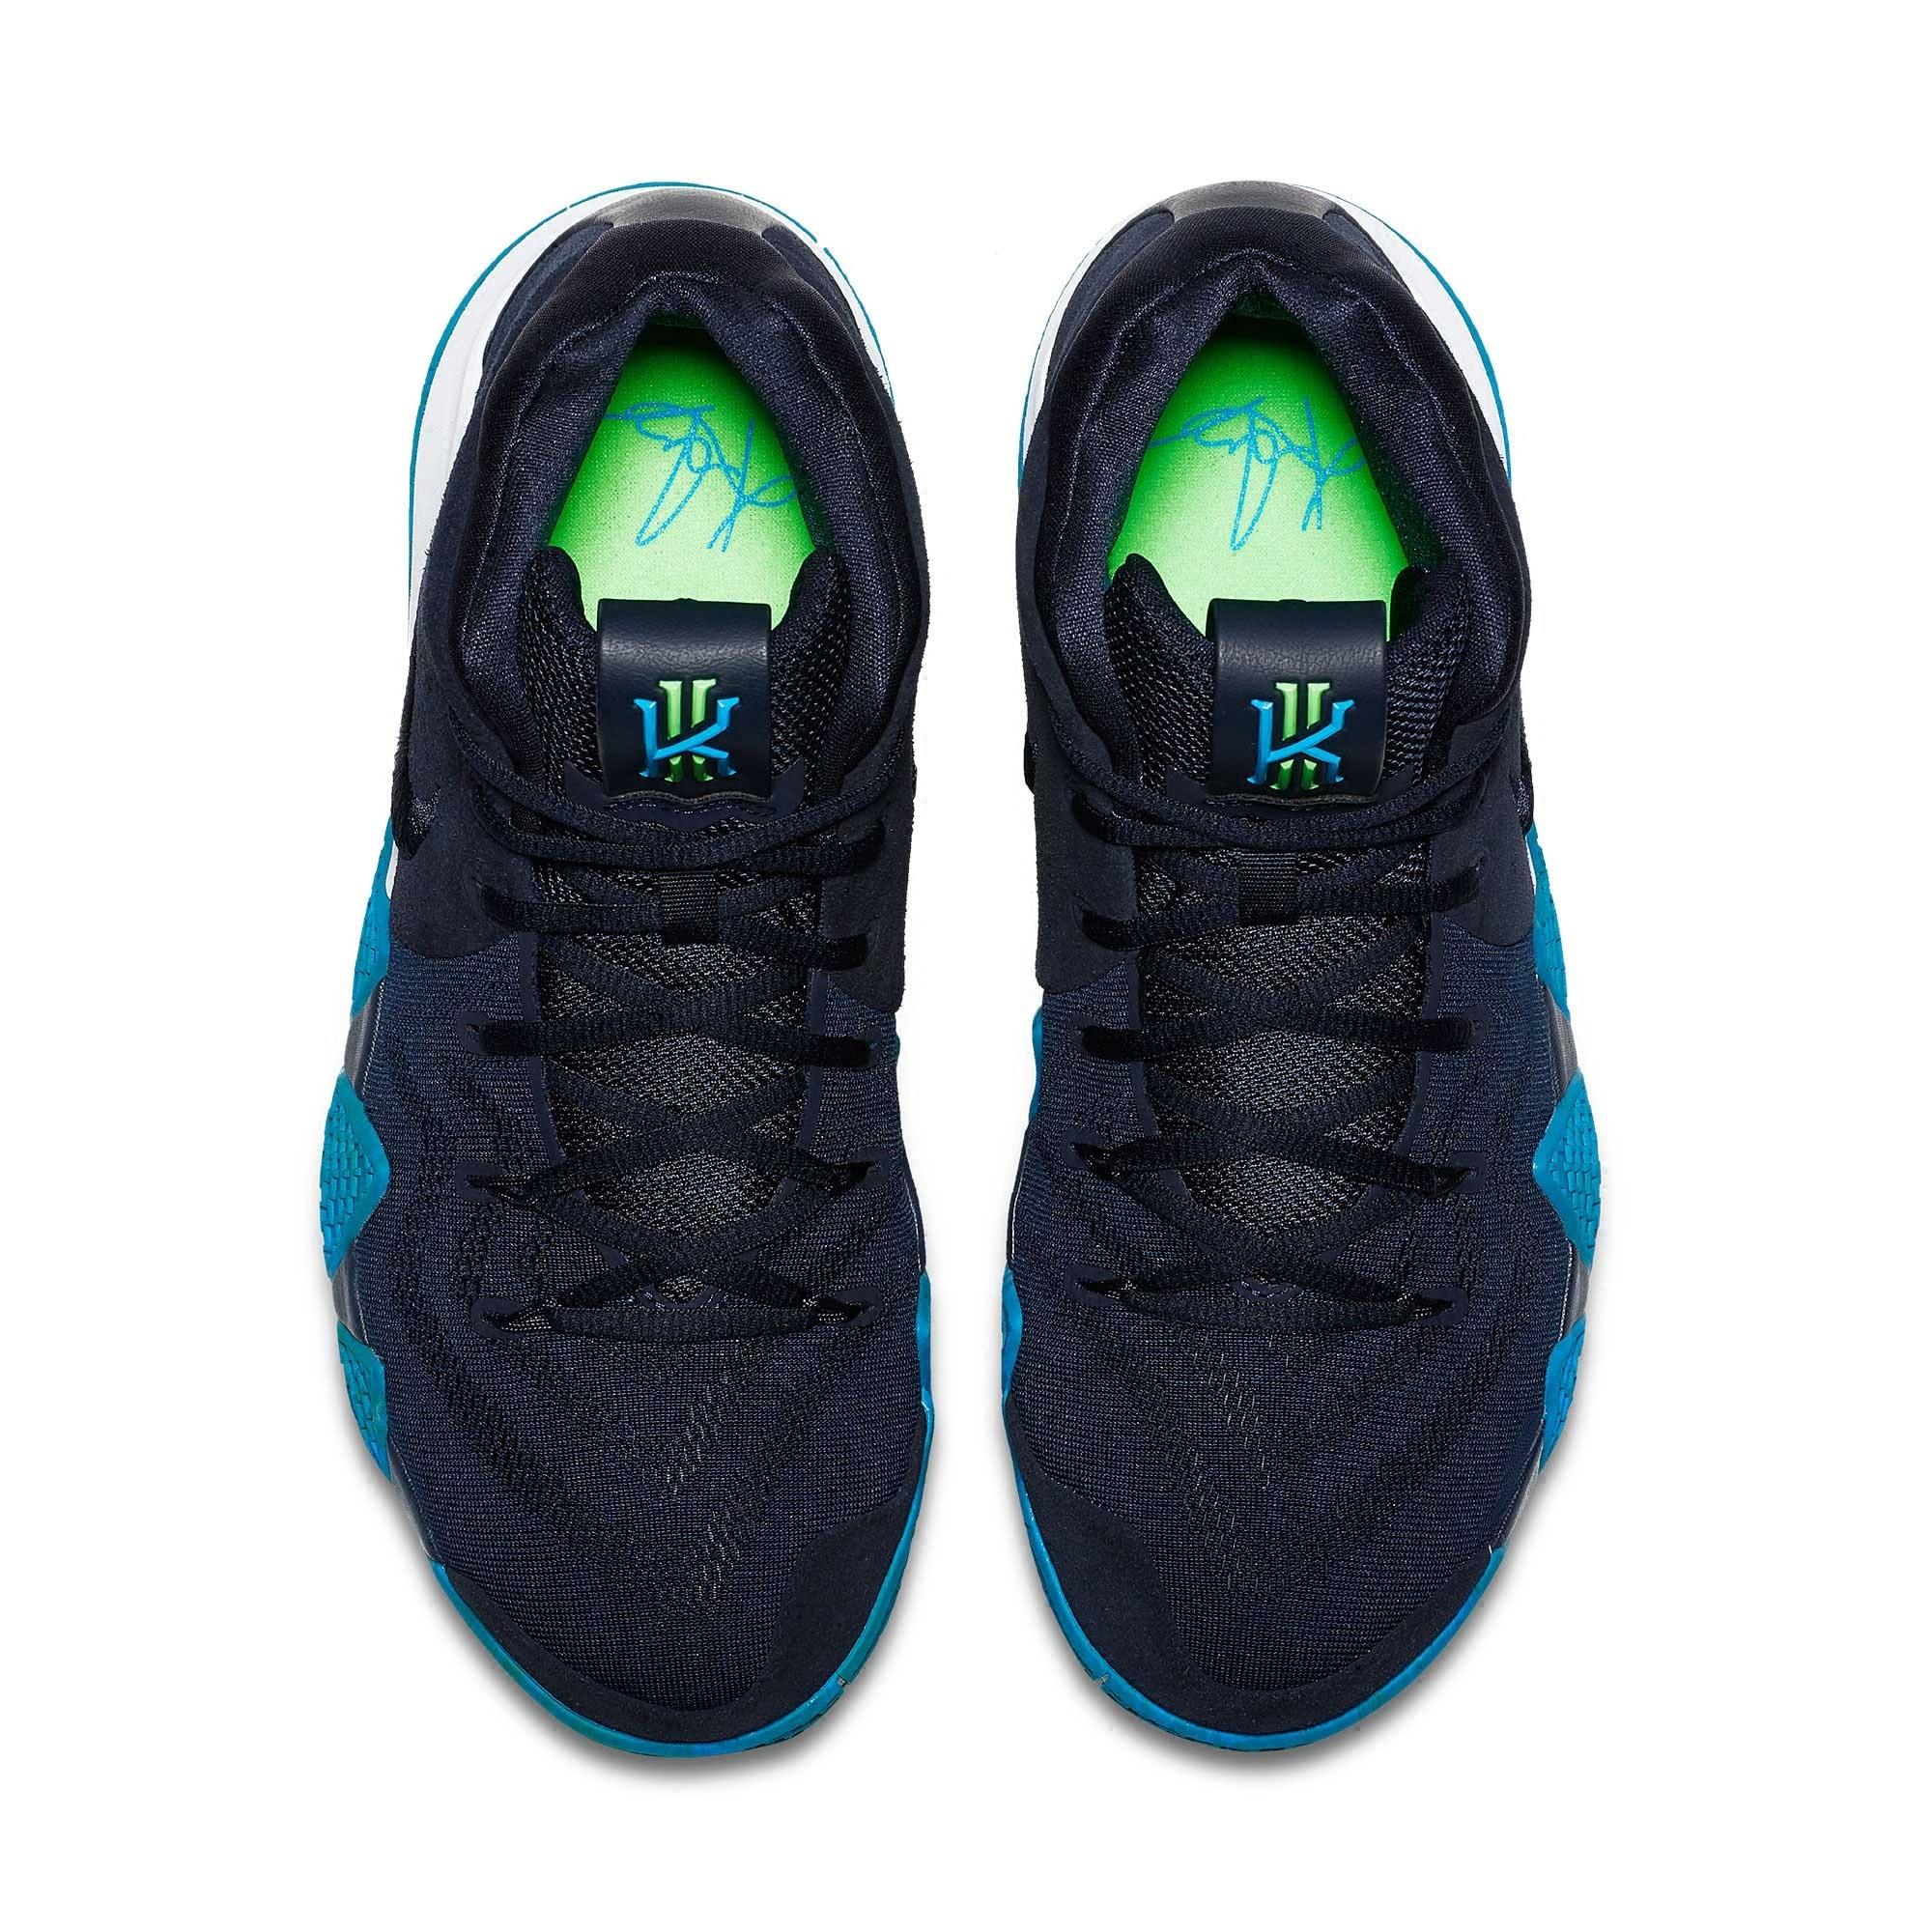 timeless design 02fd2 4326c Original Authentic NIKE KYRIE 4 EPmens Basketball Shoes Sneakers For Men  Sport Outdoor Designer athletics Top Quality 943807